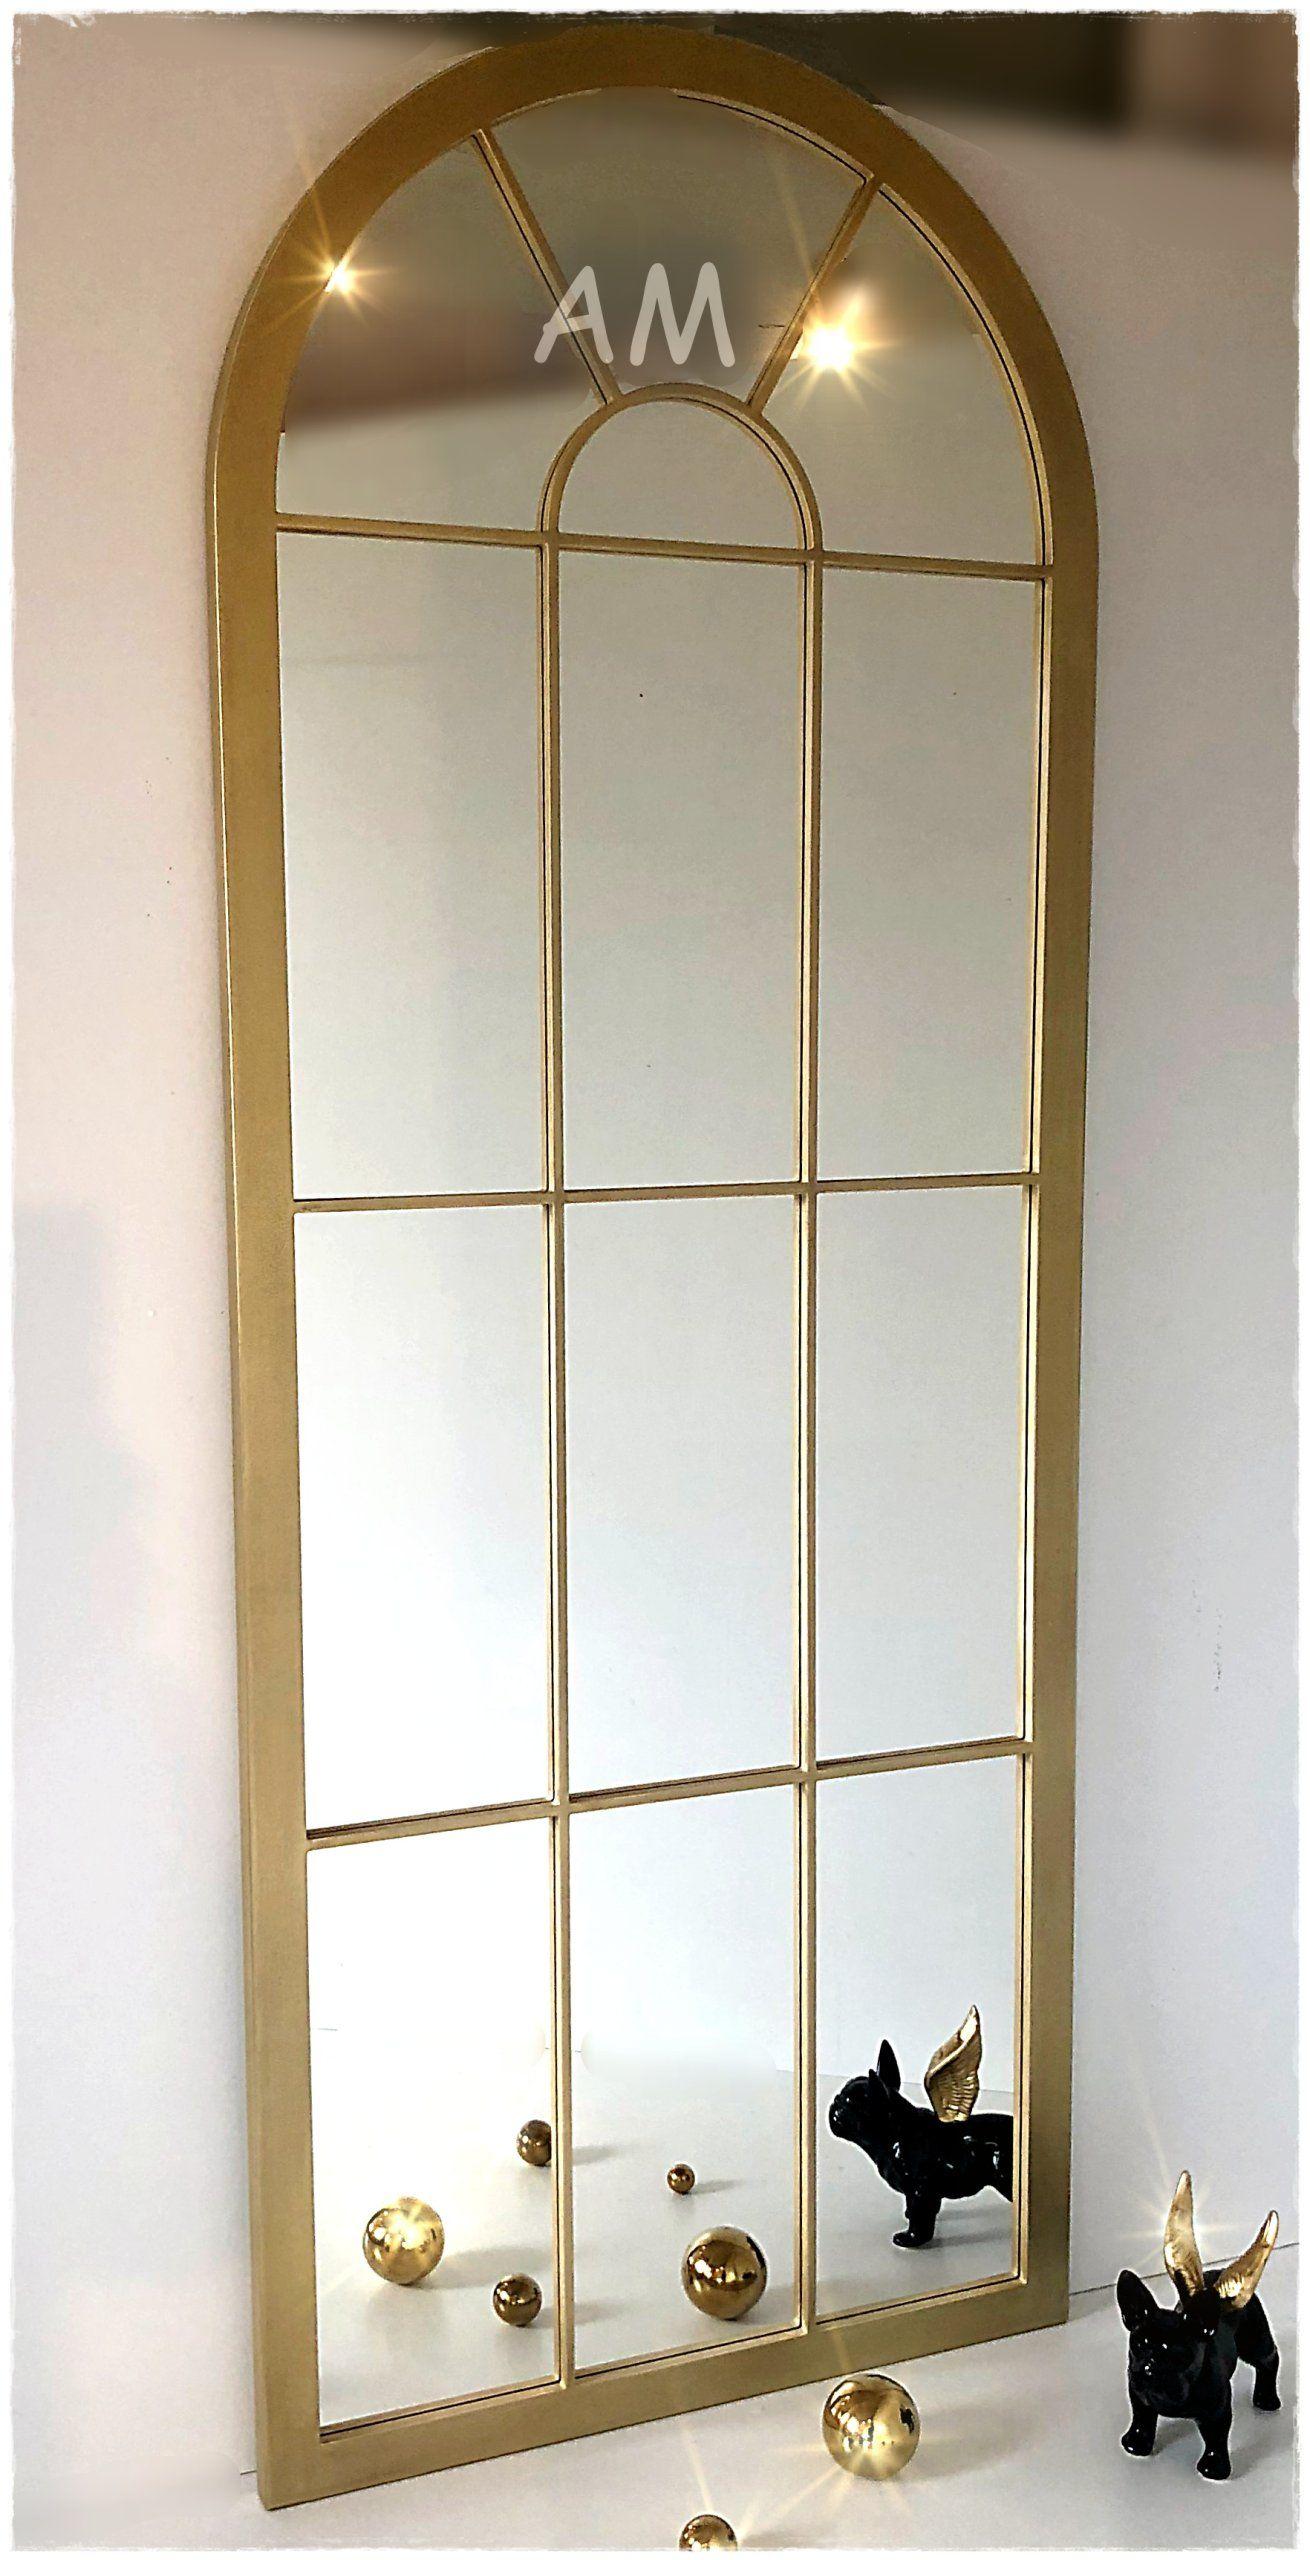 Fantastyczne Zlote Duze Lustro Okno Super Look 7569015785 Oficjalne Archiwum Allegro Mirror Oversized Mirror Decor